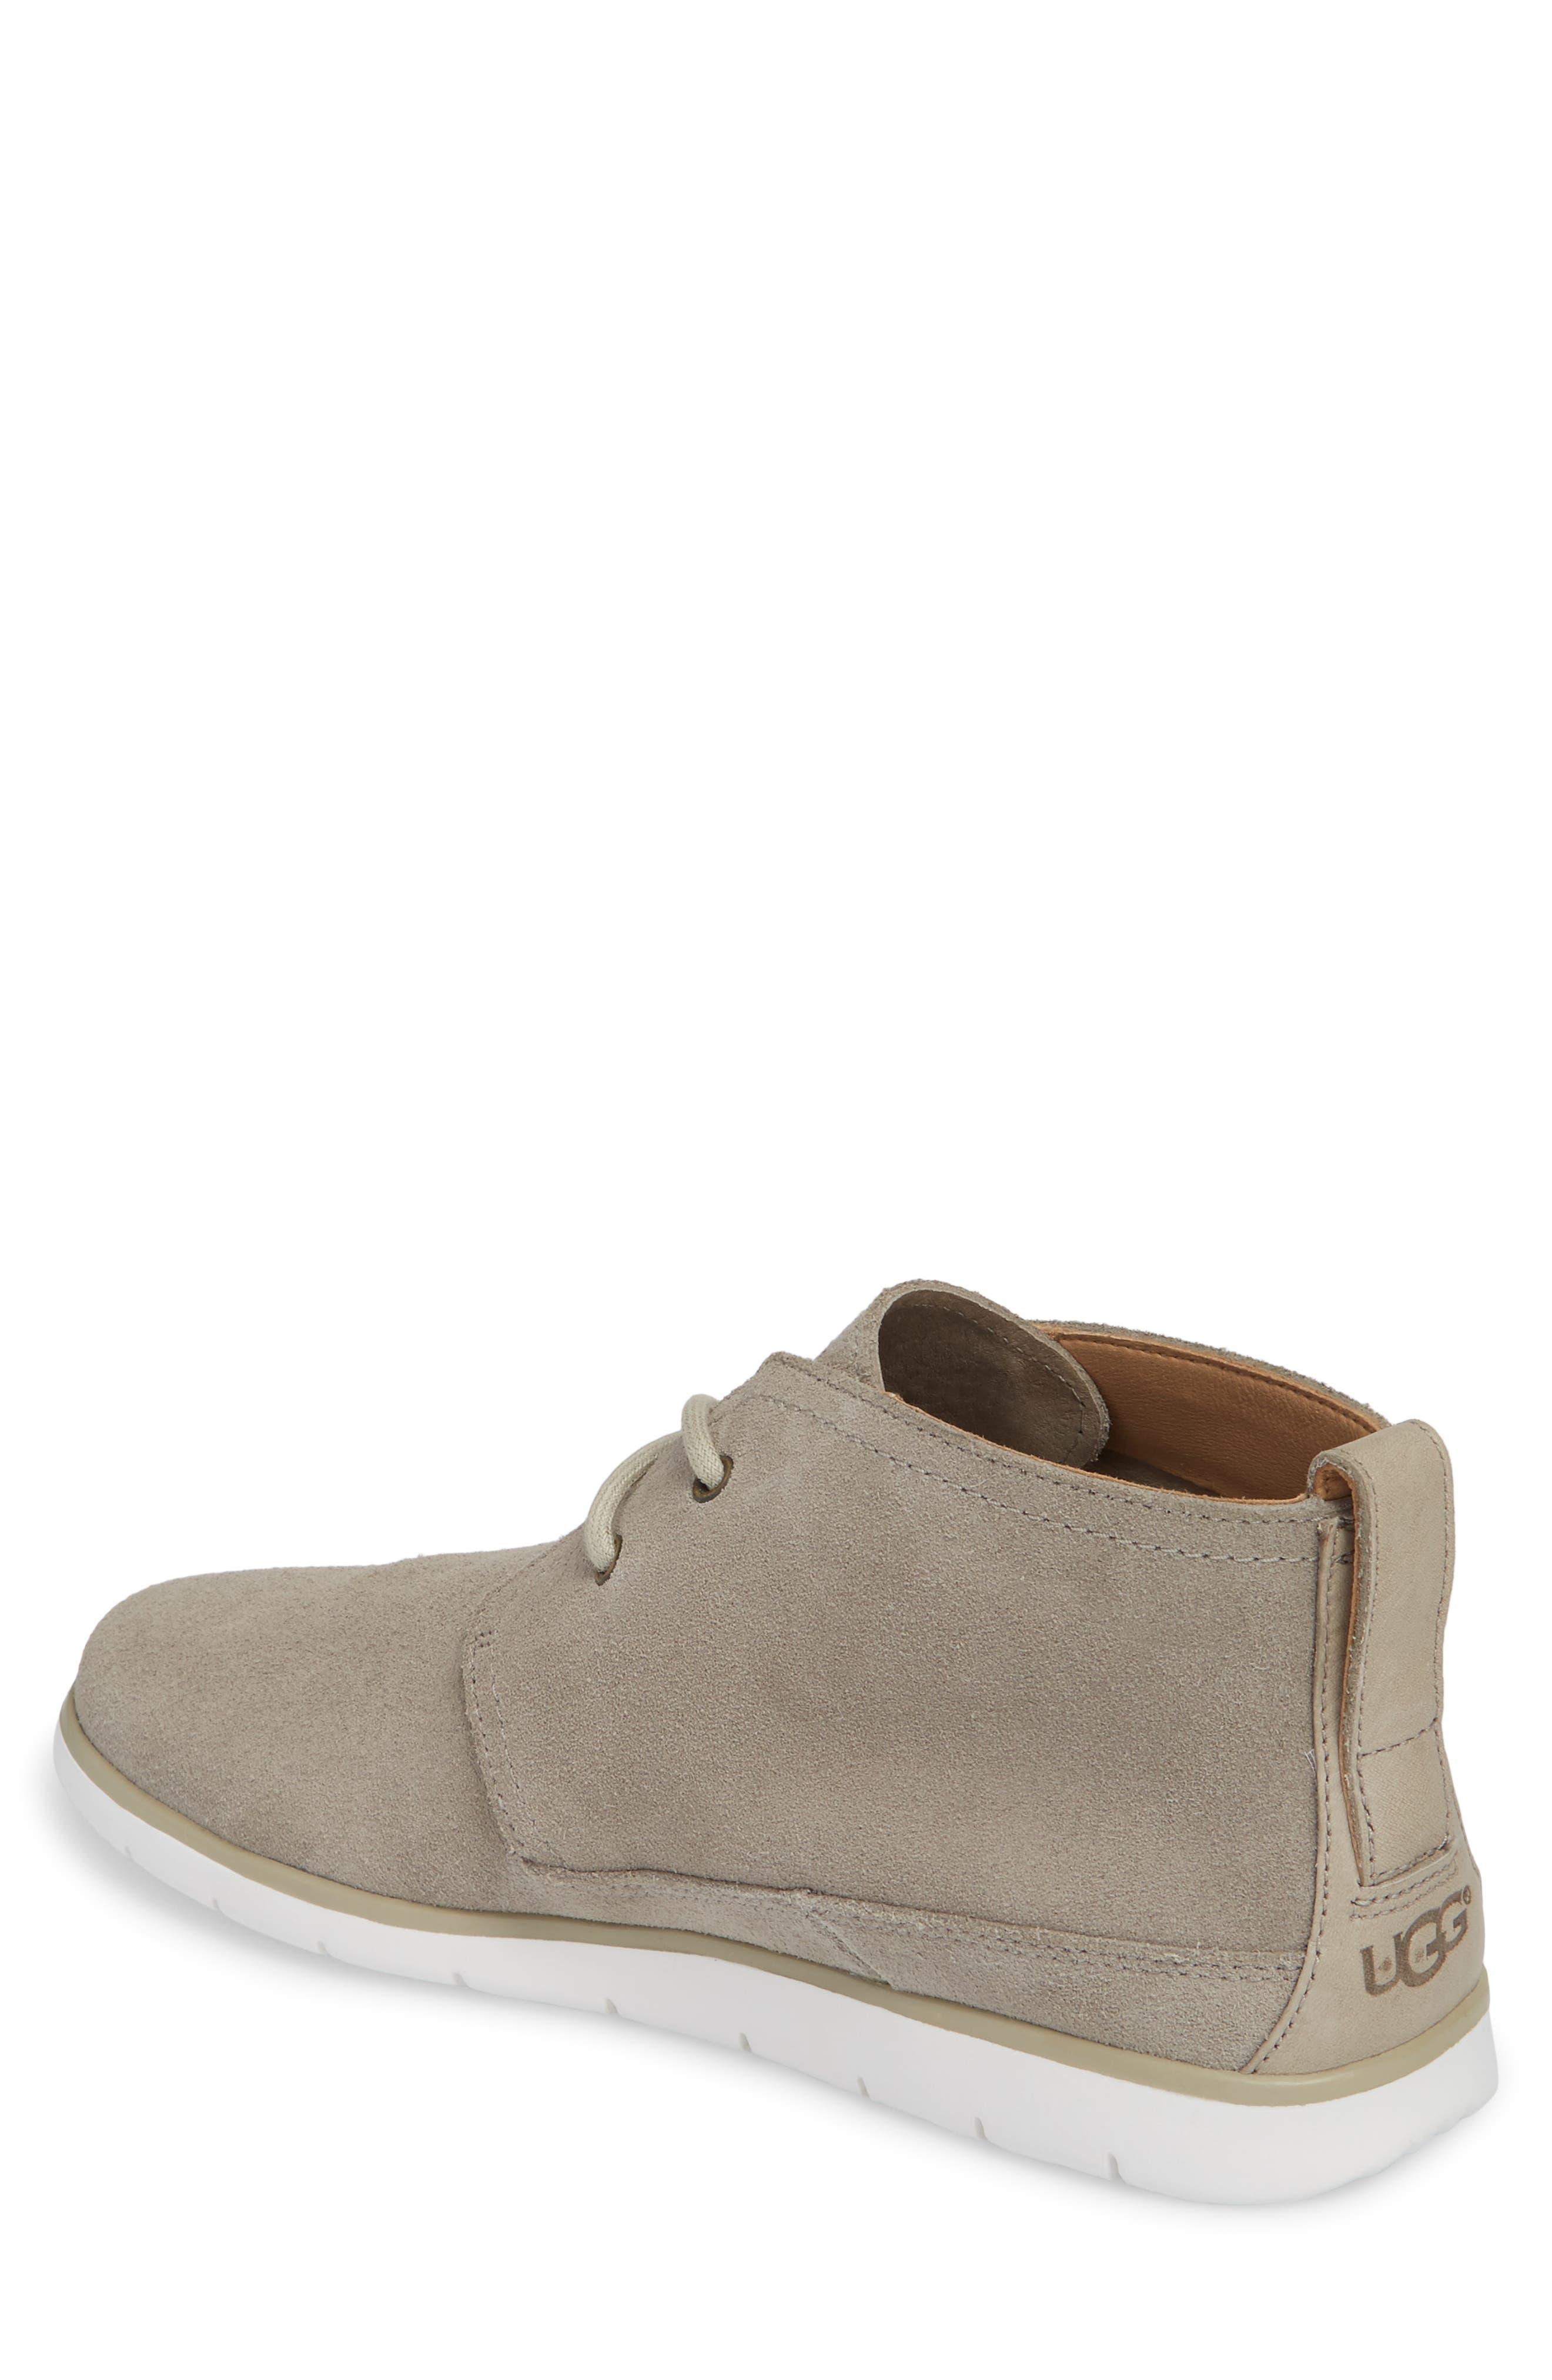 Freamon Chukka Boot,                             Alternate thumbnail 2, color,                             Pumice Leather